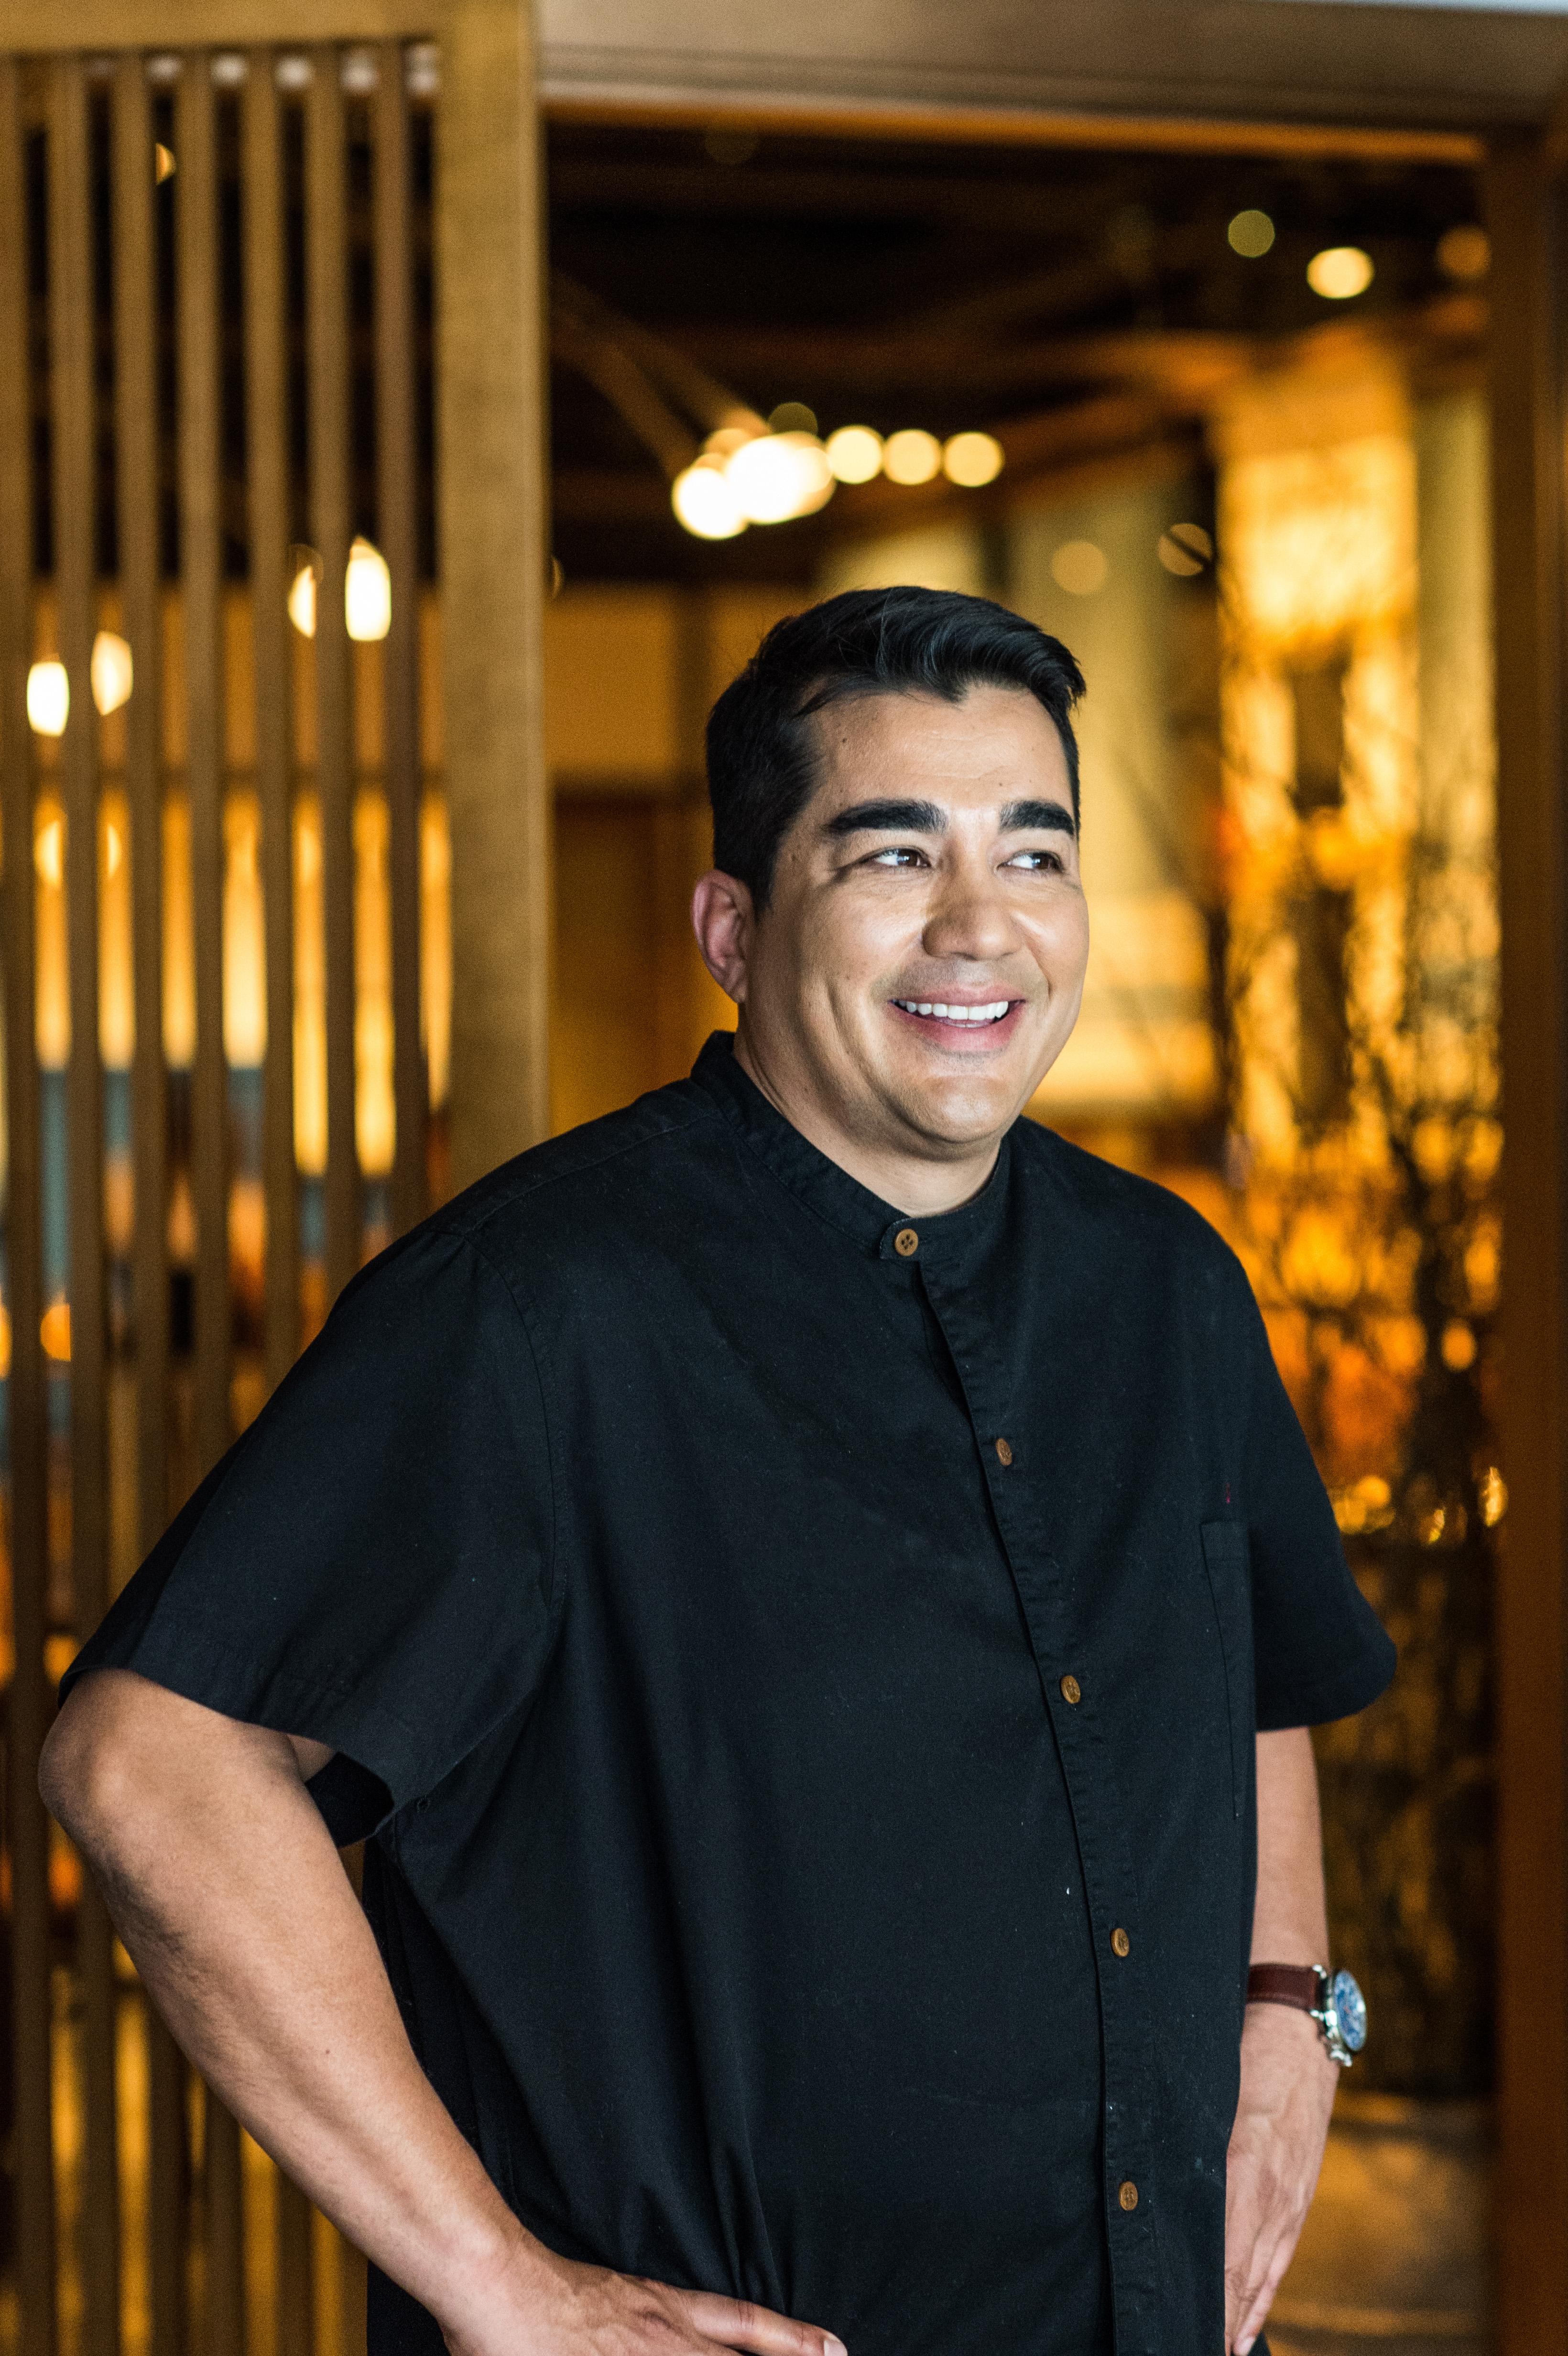 Iron Chef' Jose Garces' NYC Restaurant Was Part of Ponzi